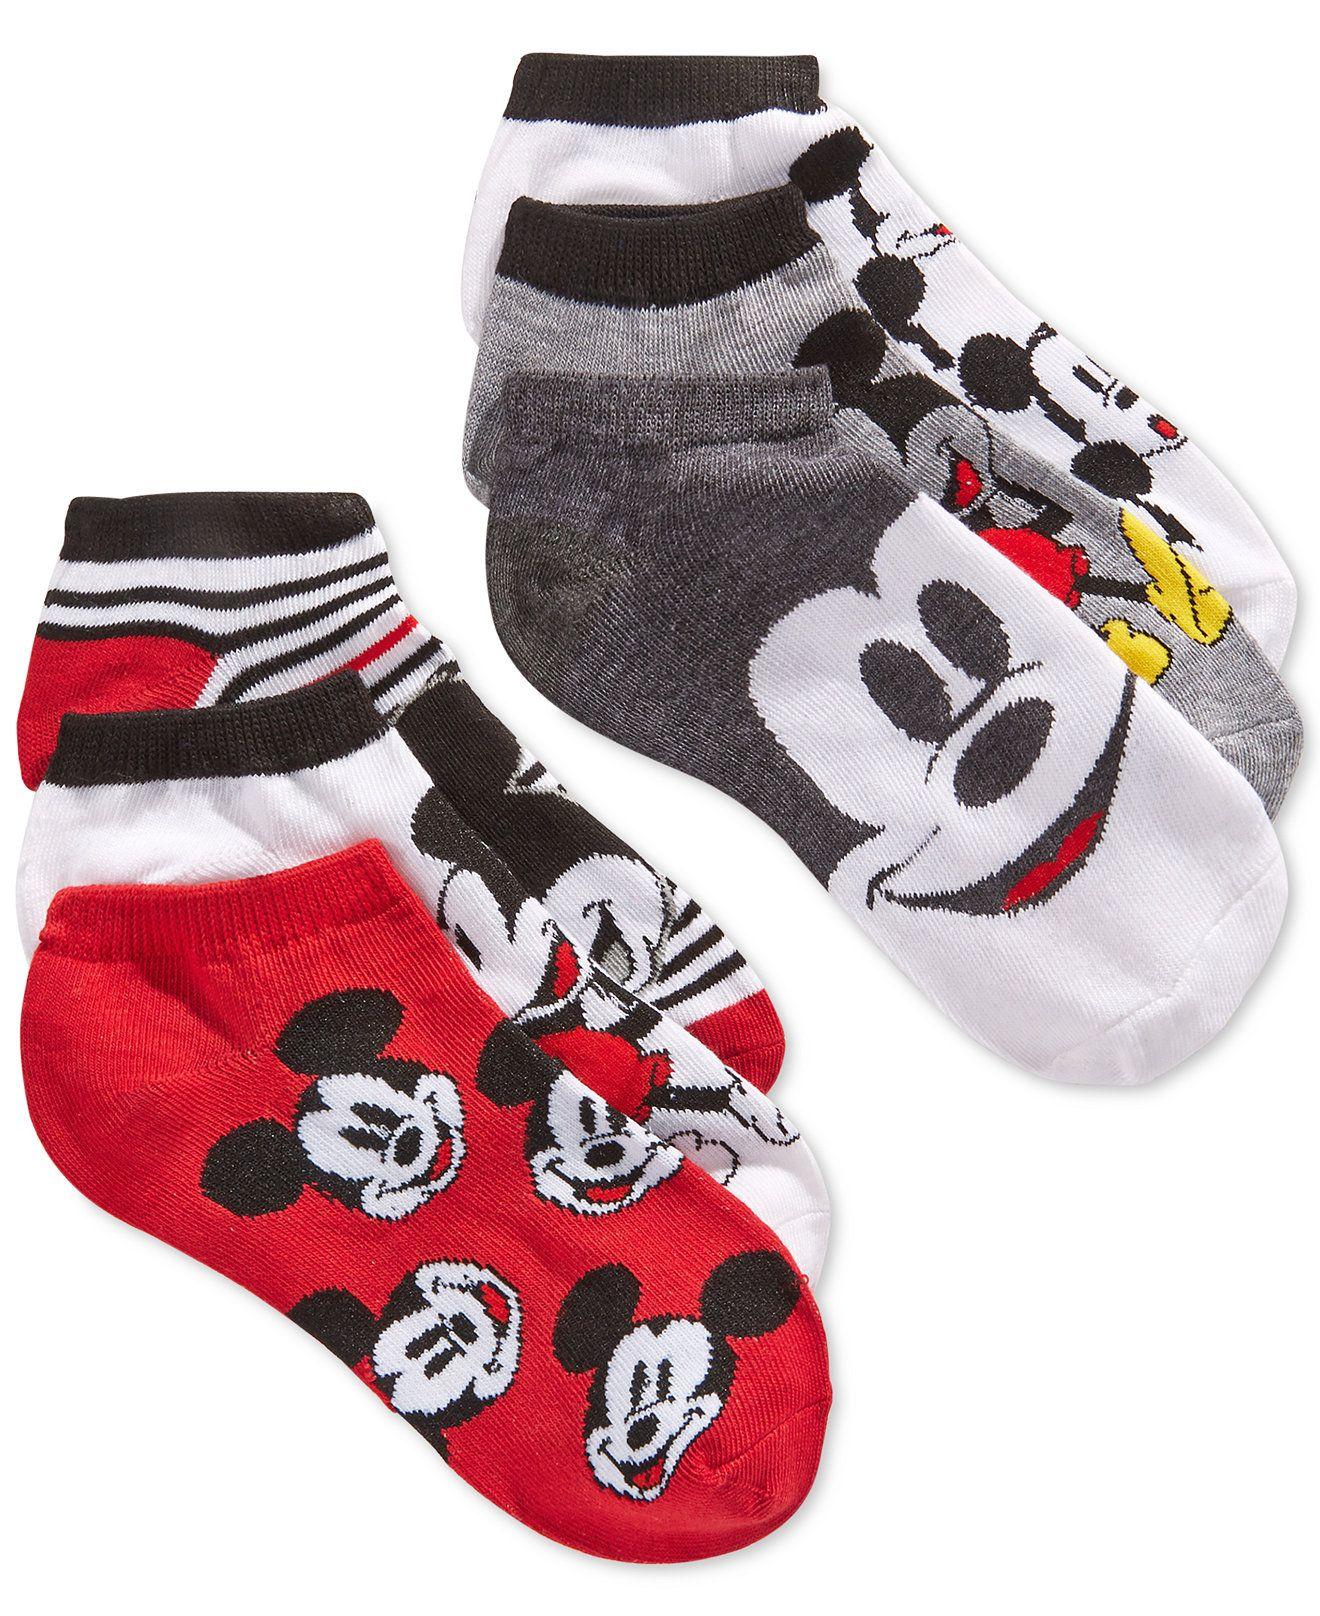 72da119d41cda Disney Women's Mickey No-Show Ankle Socks 6 Pack - Handbags ...